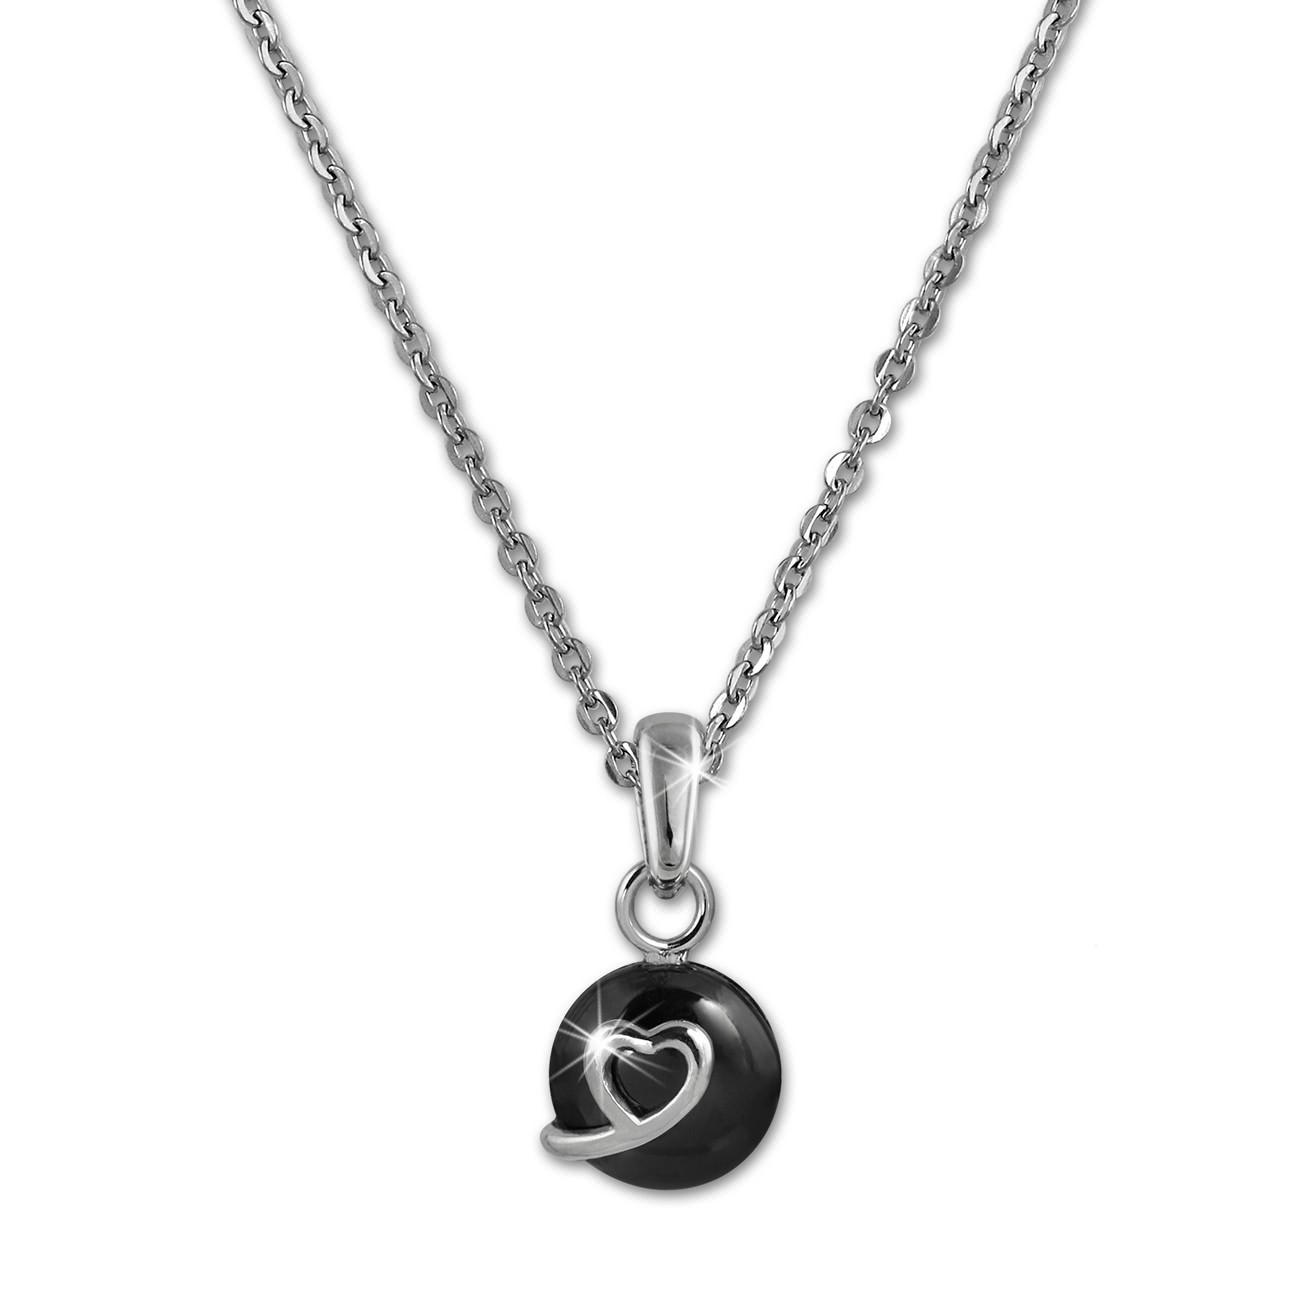 Amello Halskette Keramik Herzchen schwarz Damen Edelstahlschmuck ESKX34S5